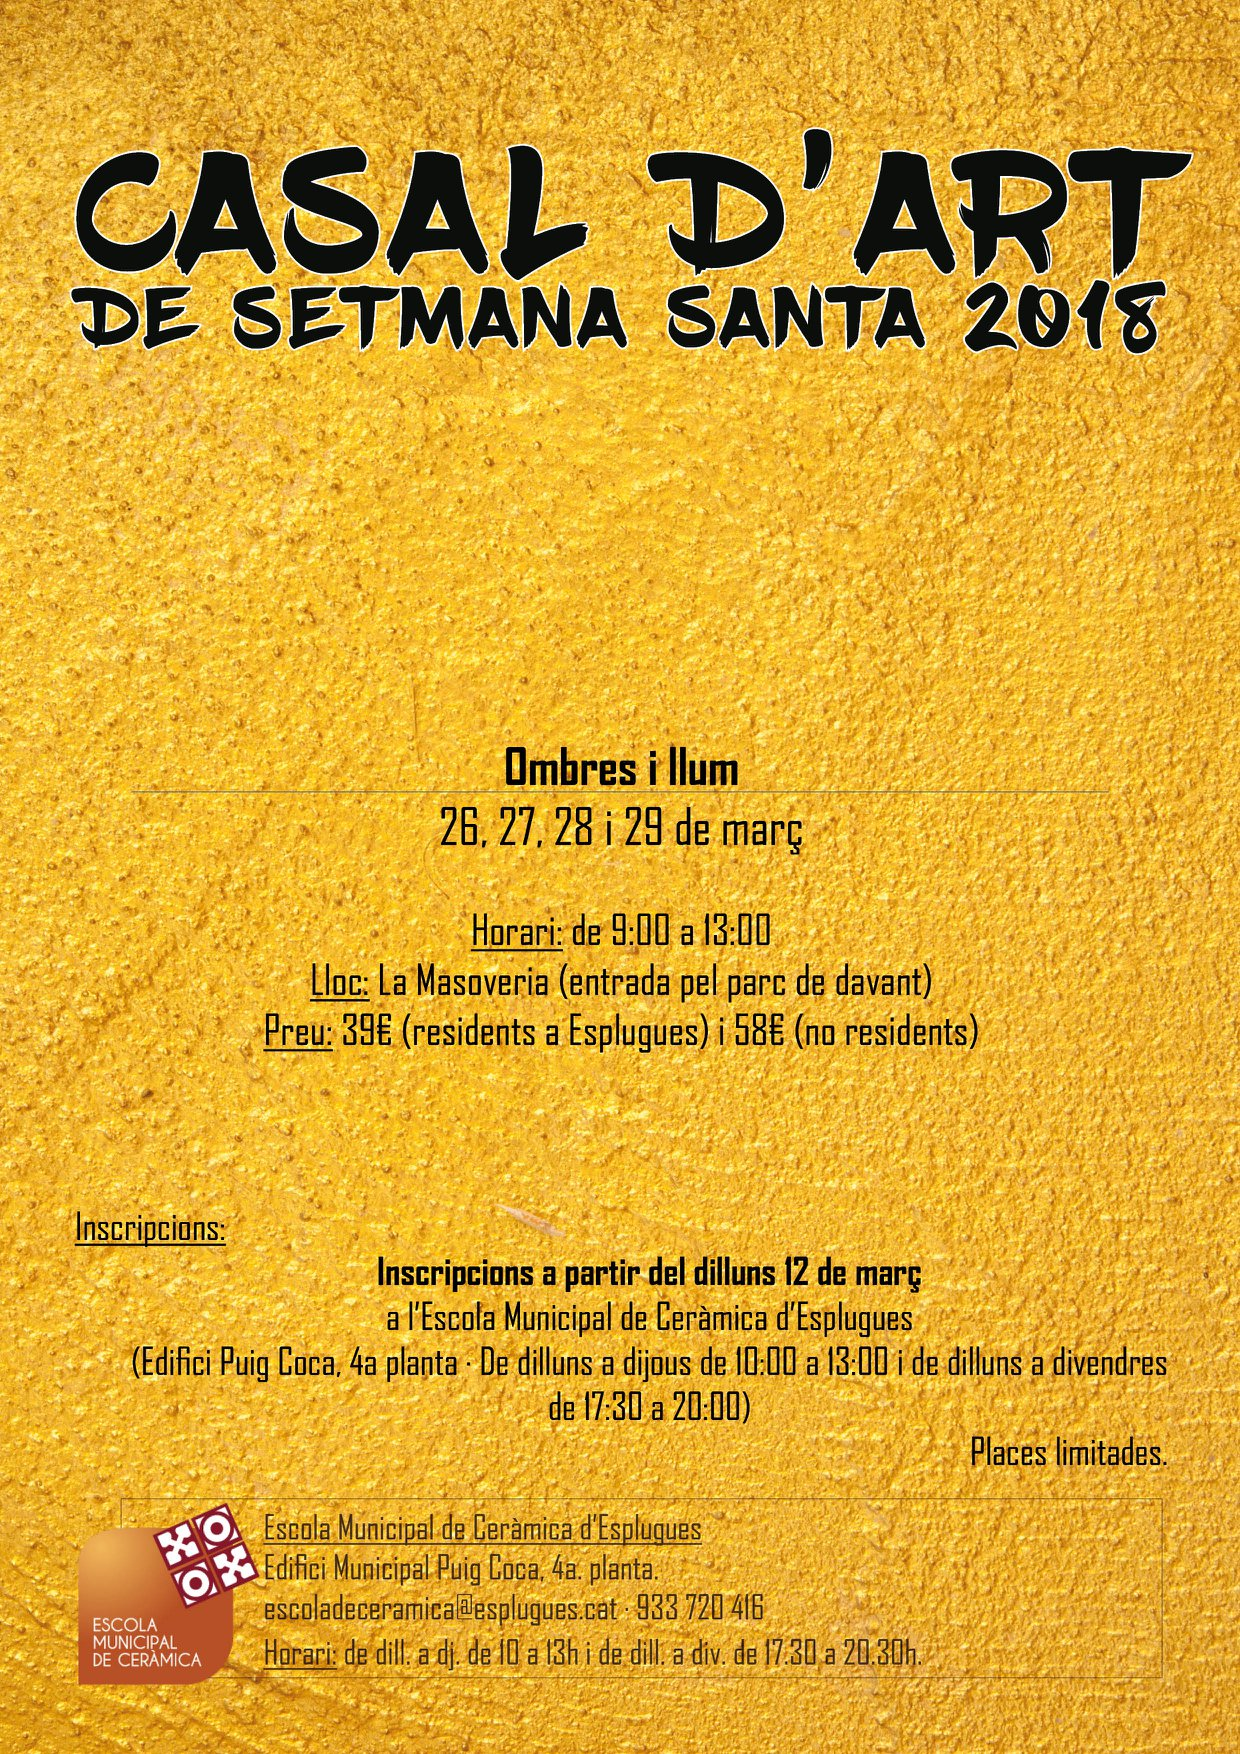 CASAL D'ART DE SETMANA SANTA